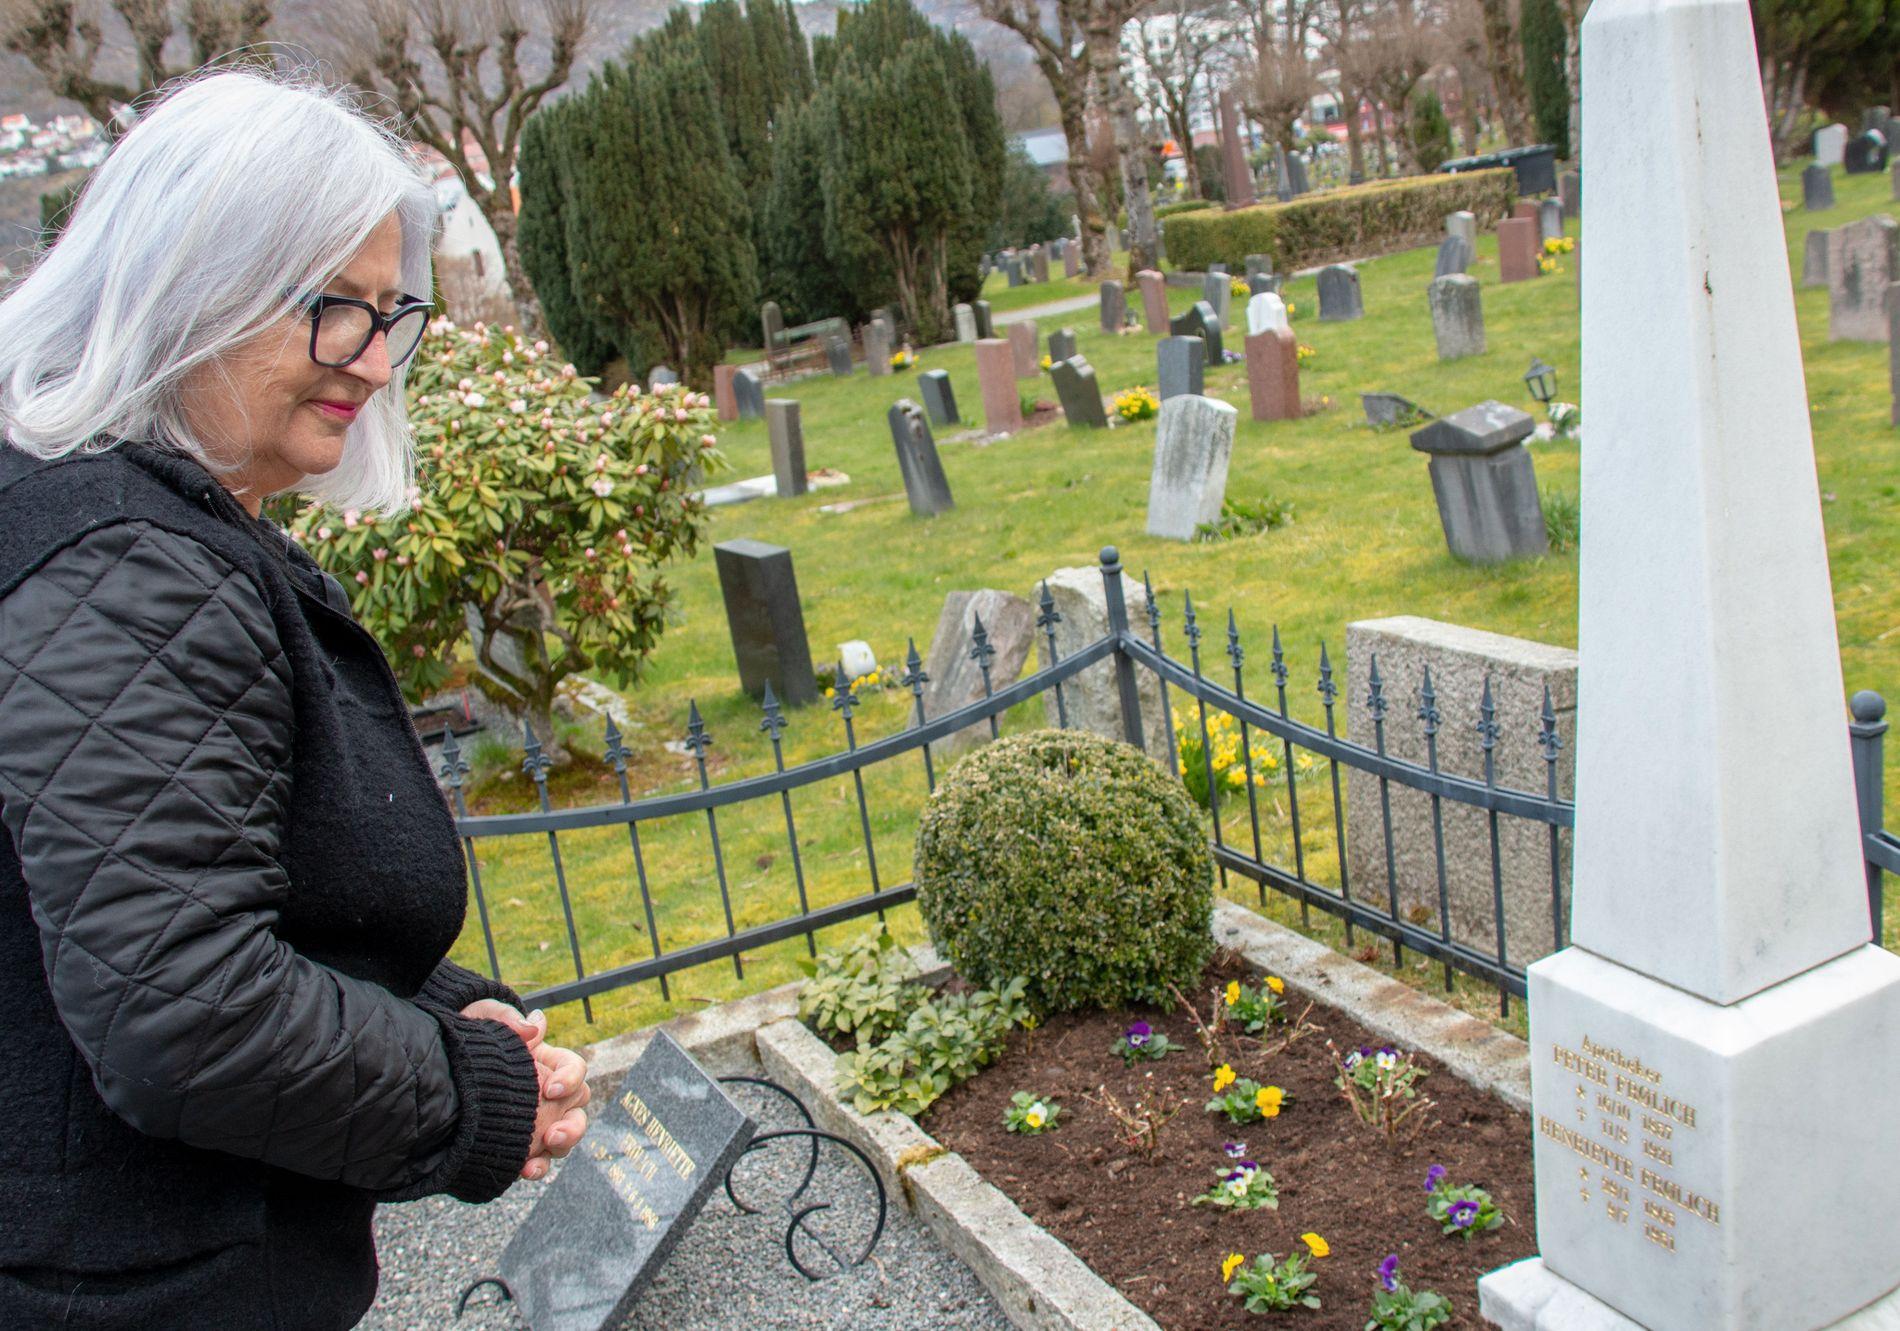 PENT GRAVSTED: Familiegravstedet til Frølich-familien er alltid velstelt og pent. Ingrid Frølich og søsknene har nemlig stellavtale med Akasia.